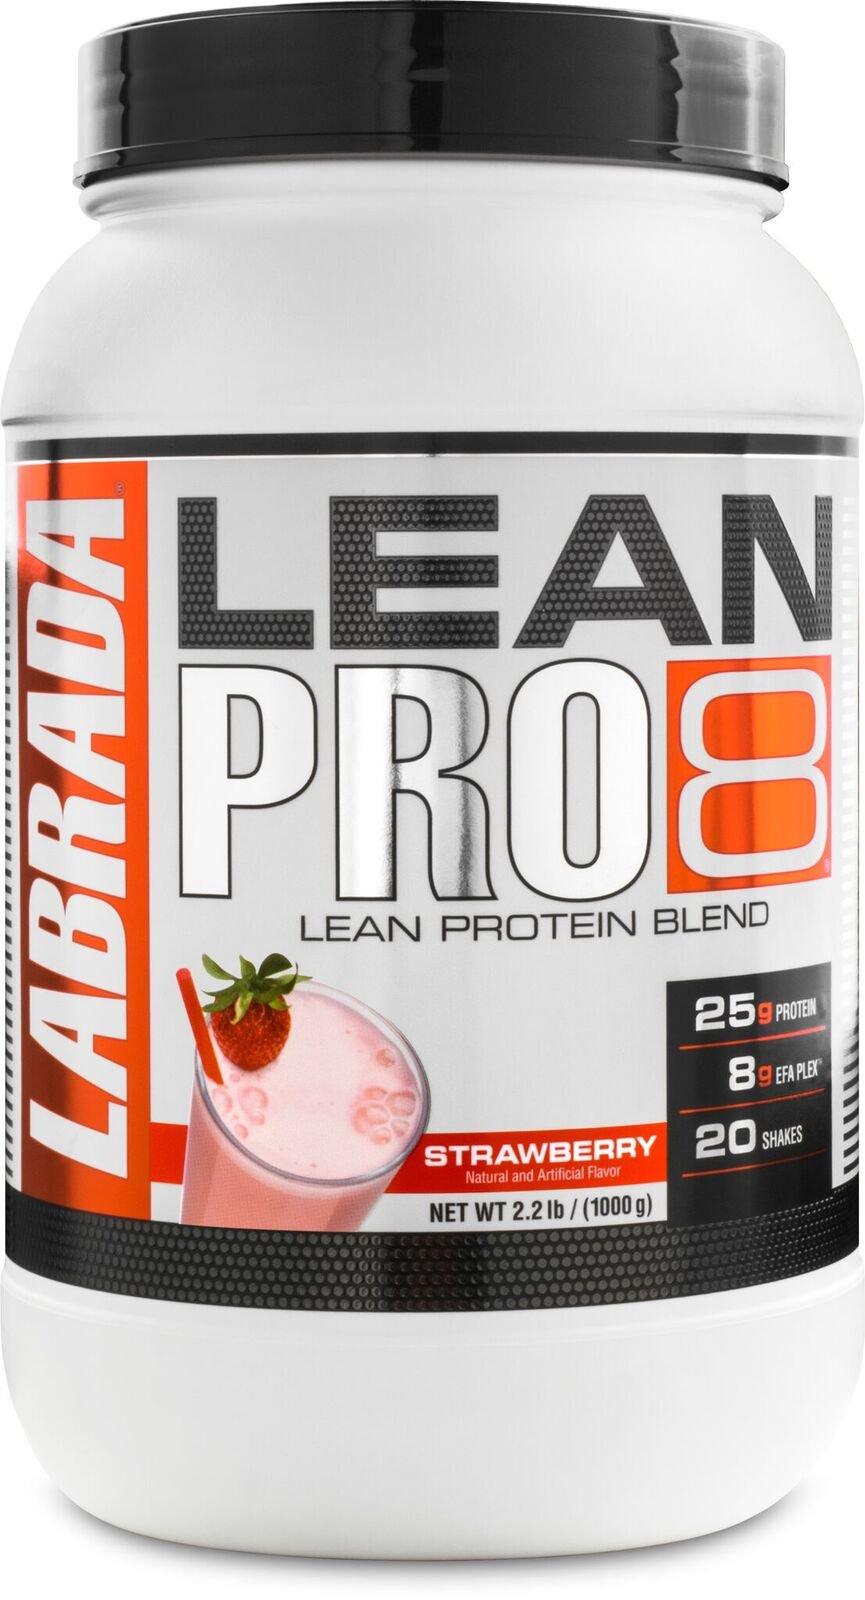 Amazon.com: Labrada Nutrition Lean Pro 8, Super Premium Protein Powder with Whey Isolate